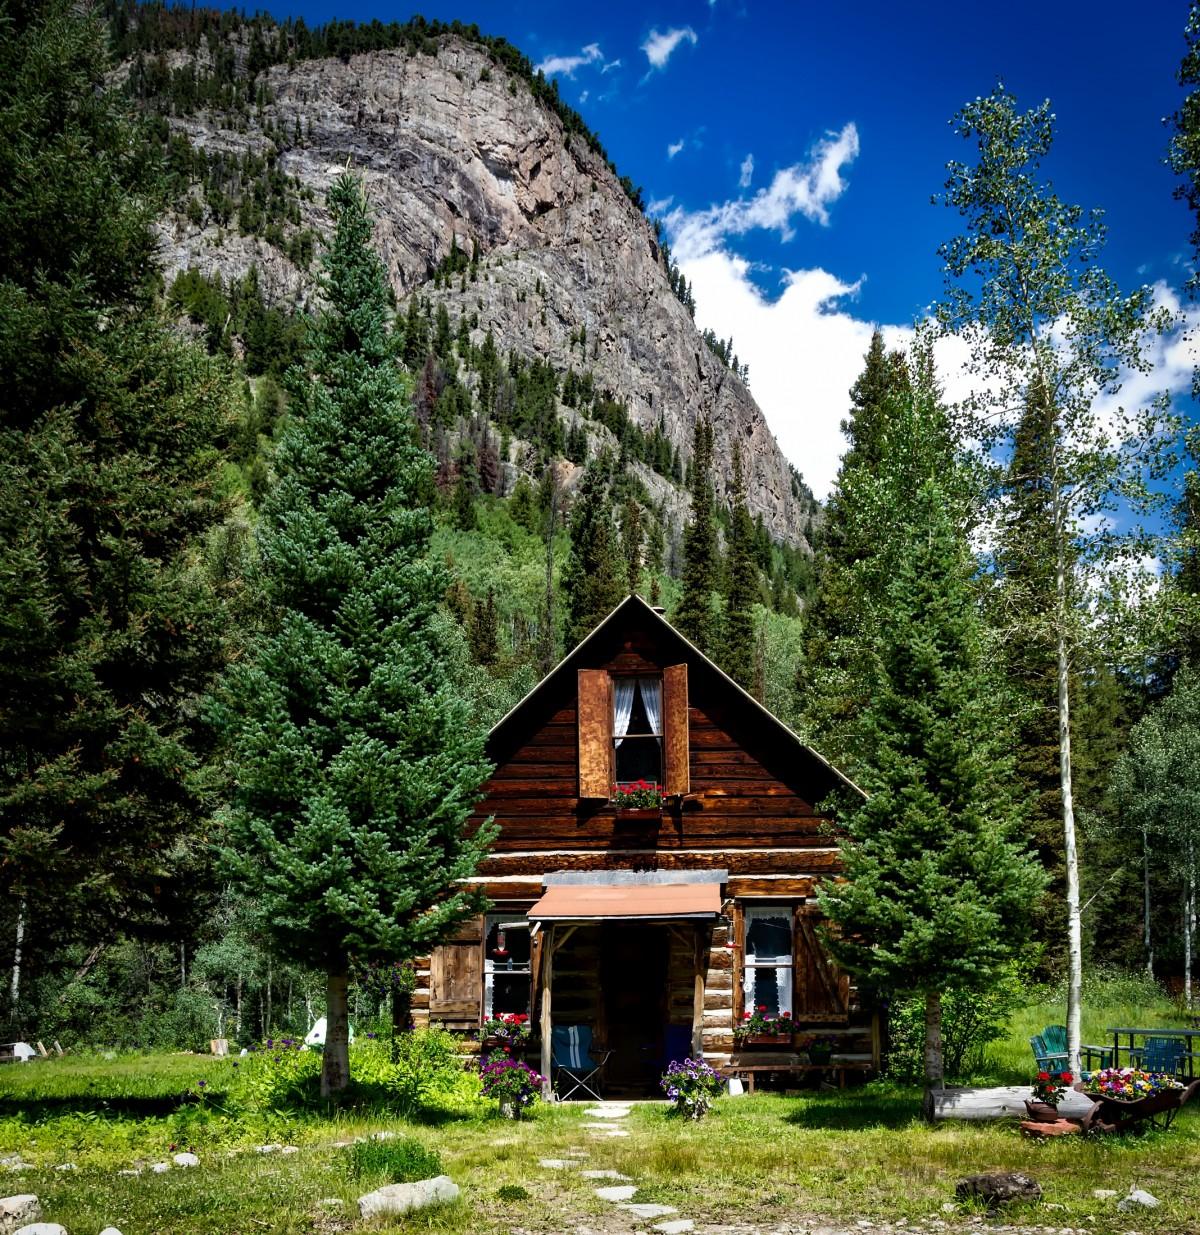 House Landscape Images: Free Images : Landscape, Nature, Forest, Wilderness, Lawn